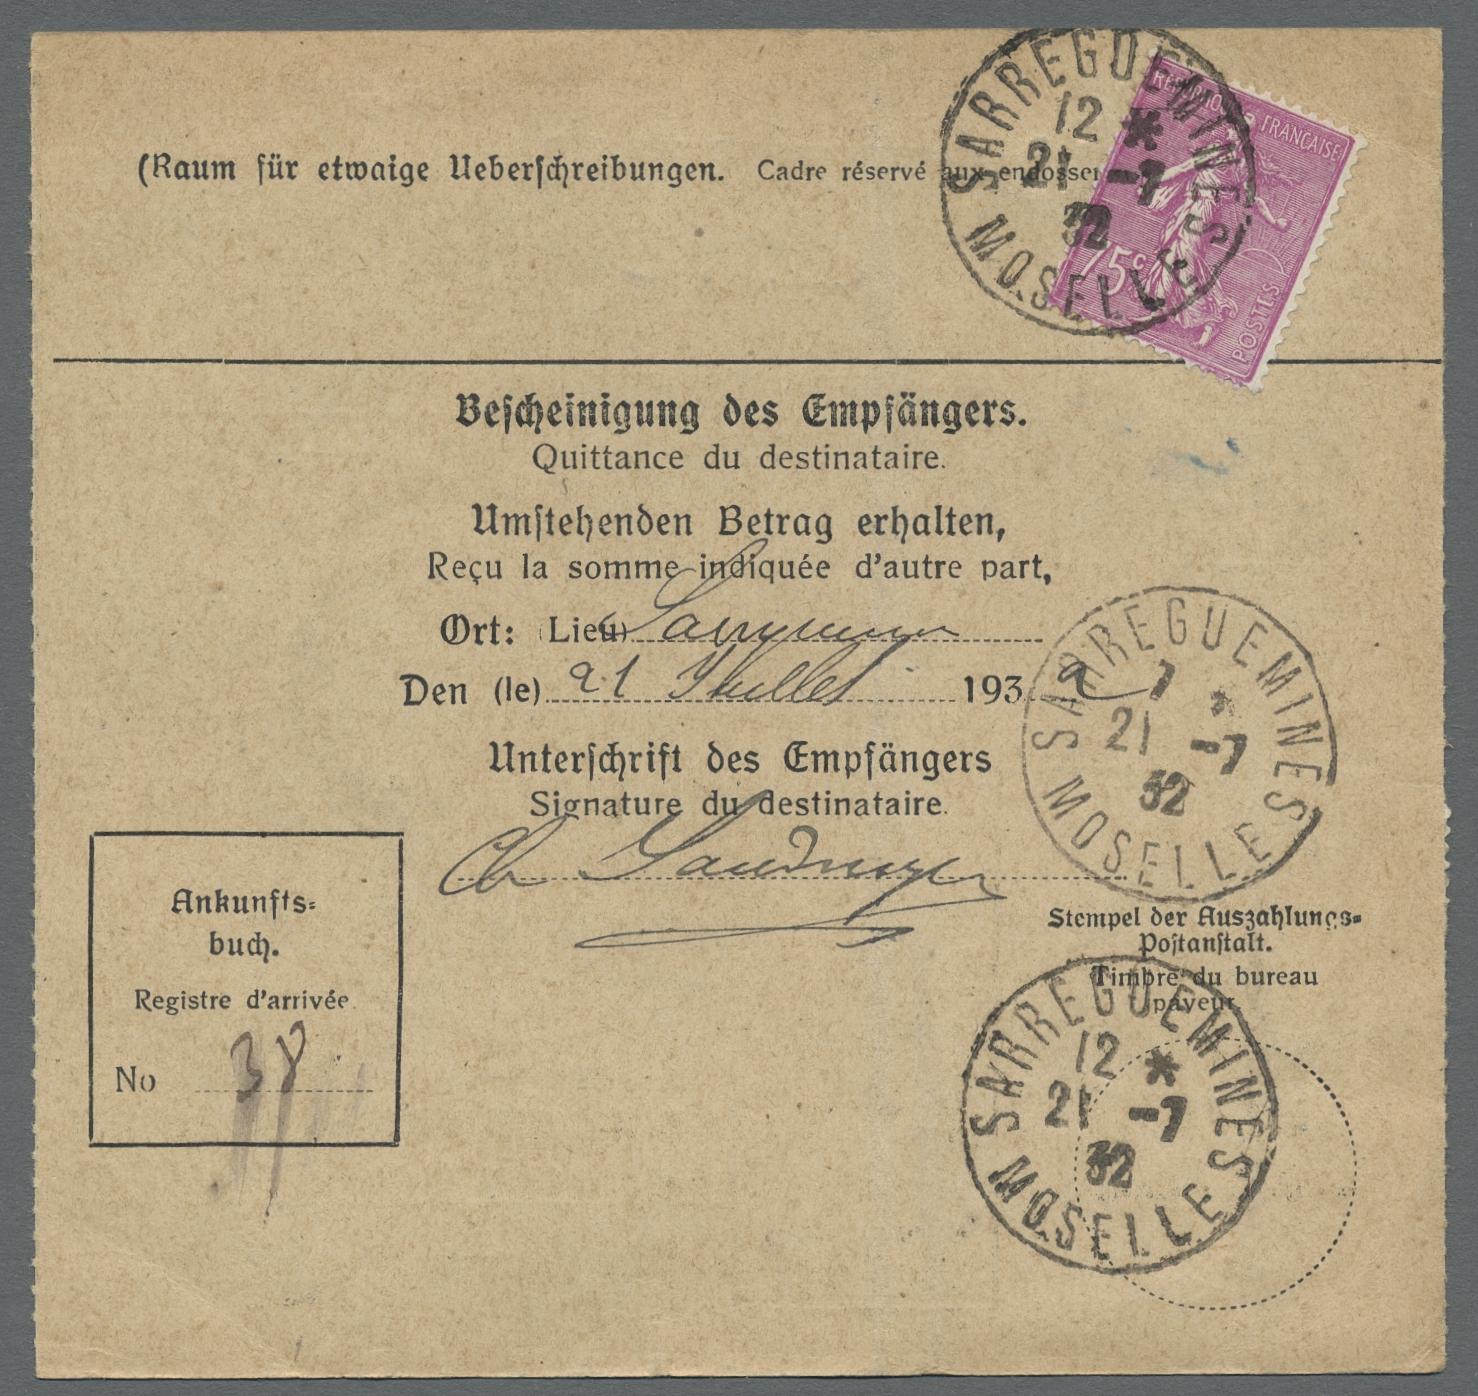 Lot 28856 - Deutsche Abstimmungsgebiete: Saargebiet  -  Auktionshaus Christoph Gärtner GmbH & Co. KG Sale #46 Gollcetions Germany - including the suplement